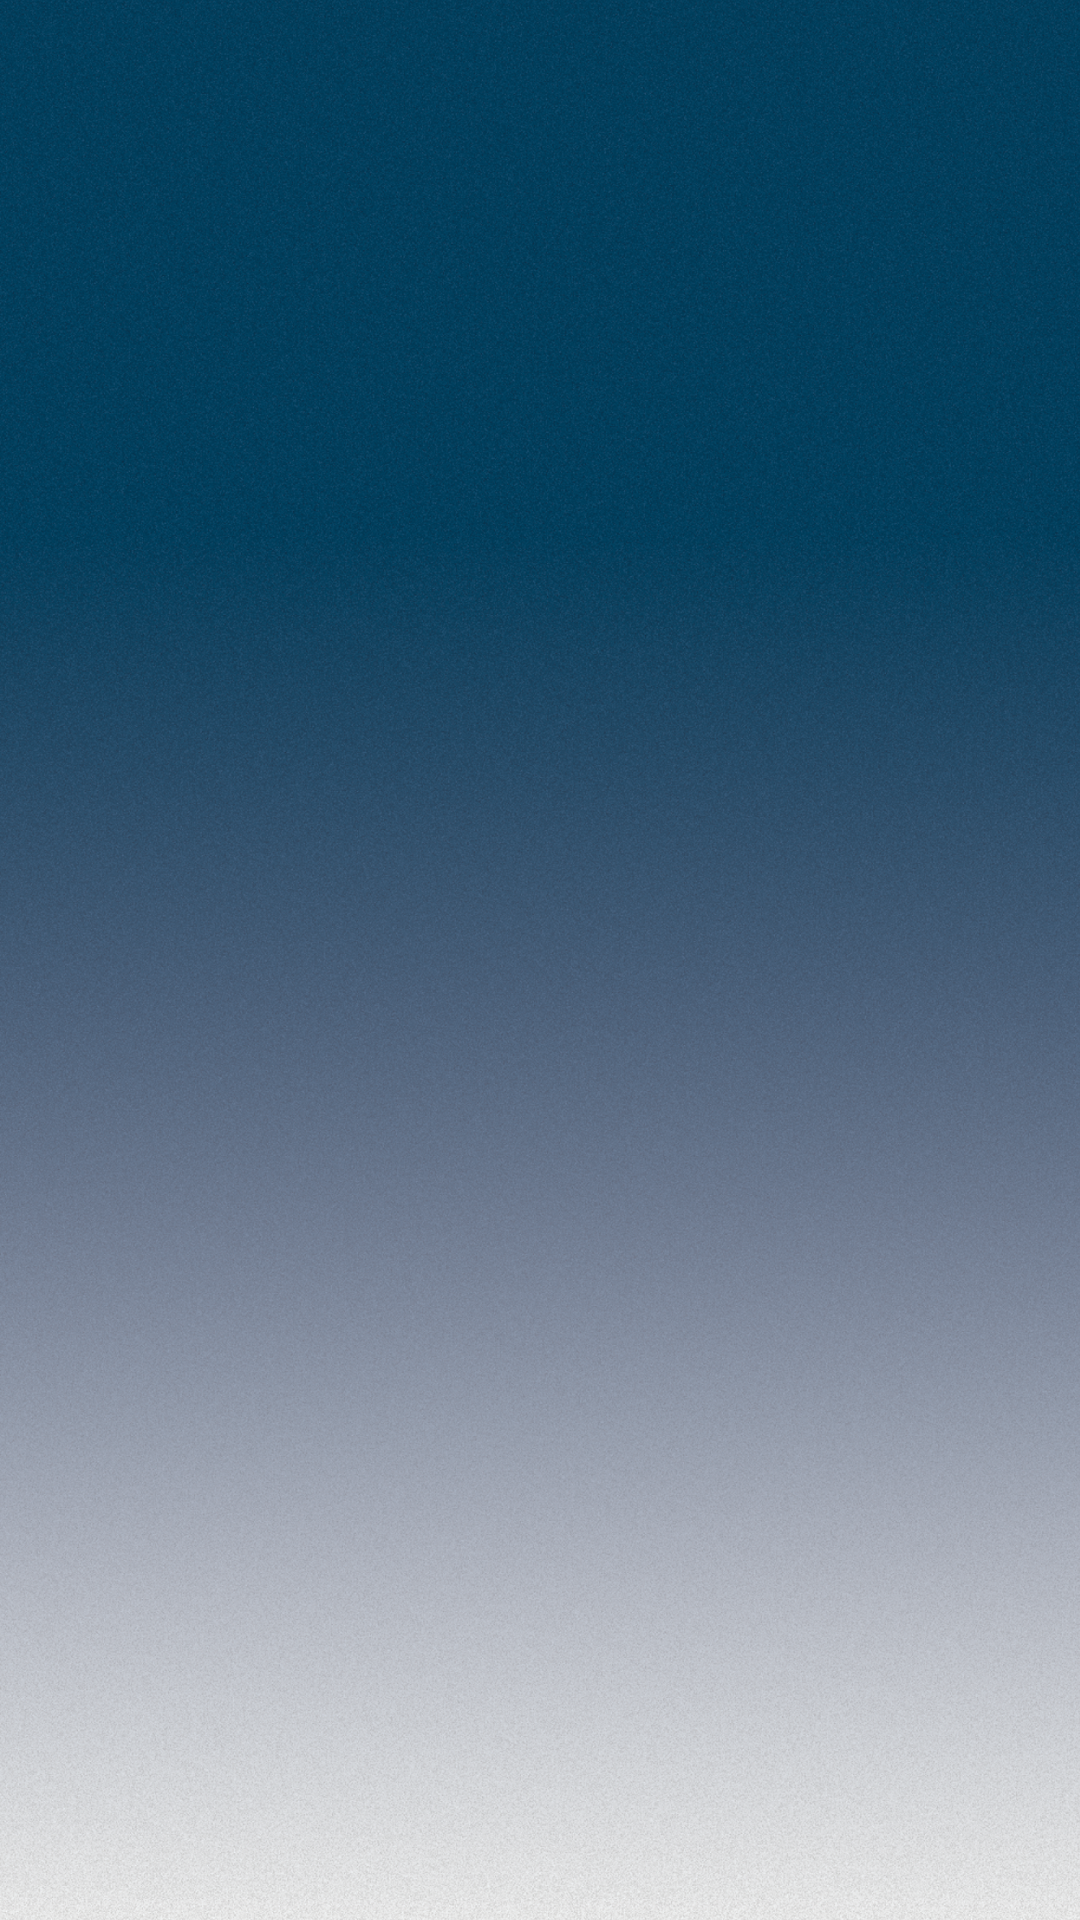 Ombre Blue Chevron Wallpaper Widescreen » Hupages